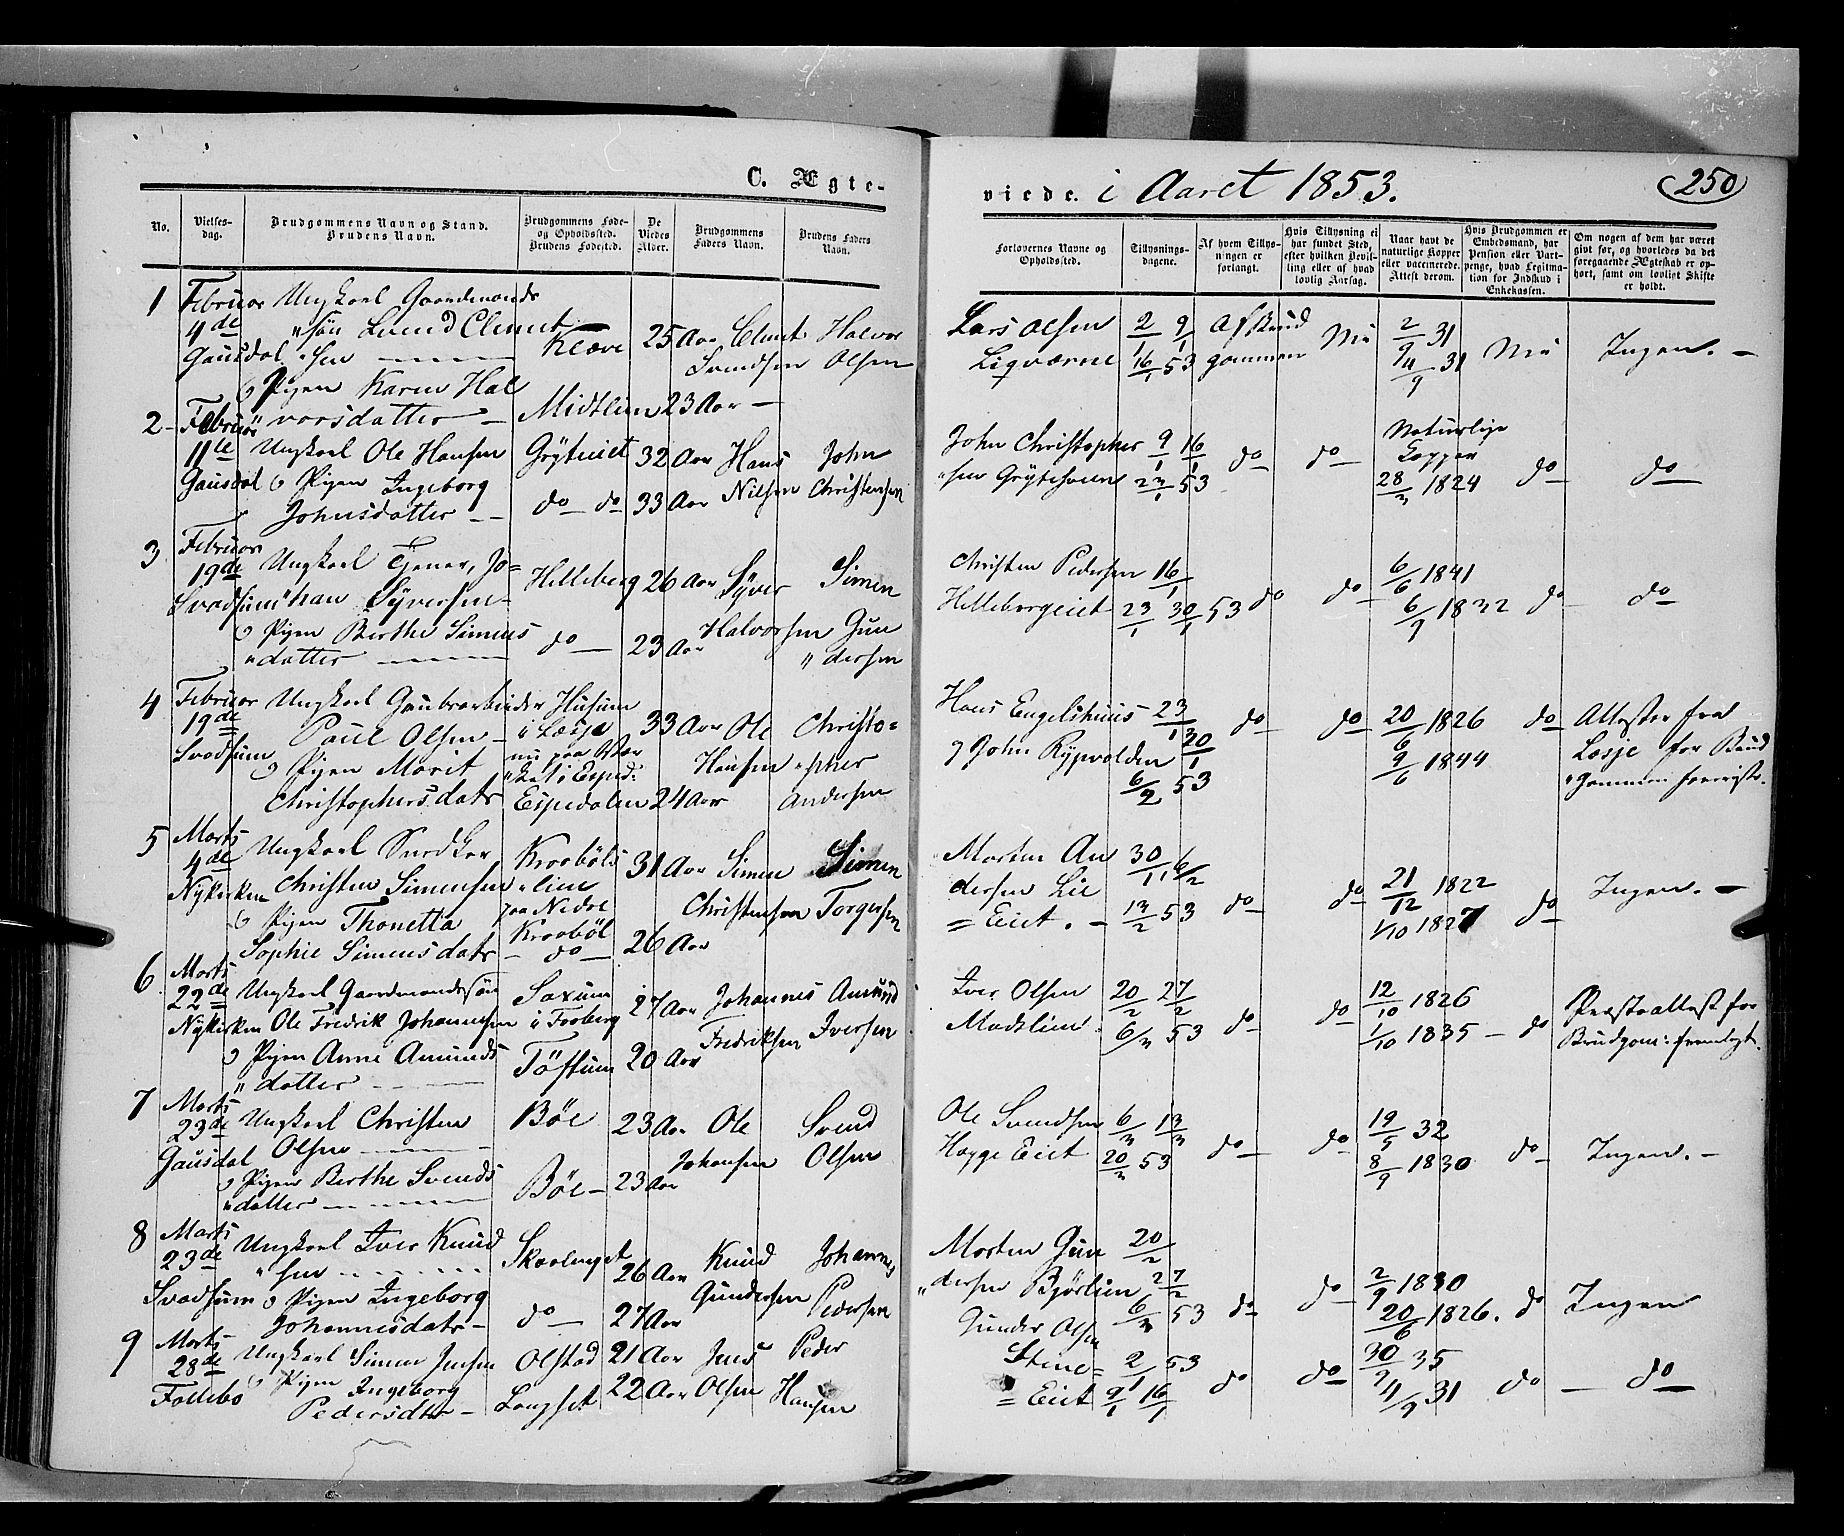 SAH, Gausdal prestekontor, Ministerialbok nr. 8, 1850-1861, s. 250